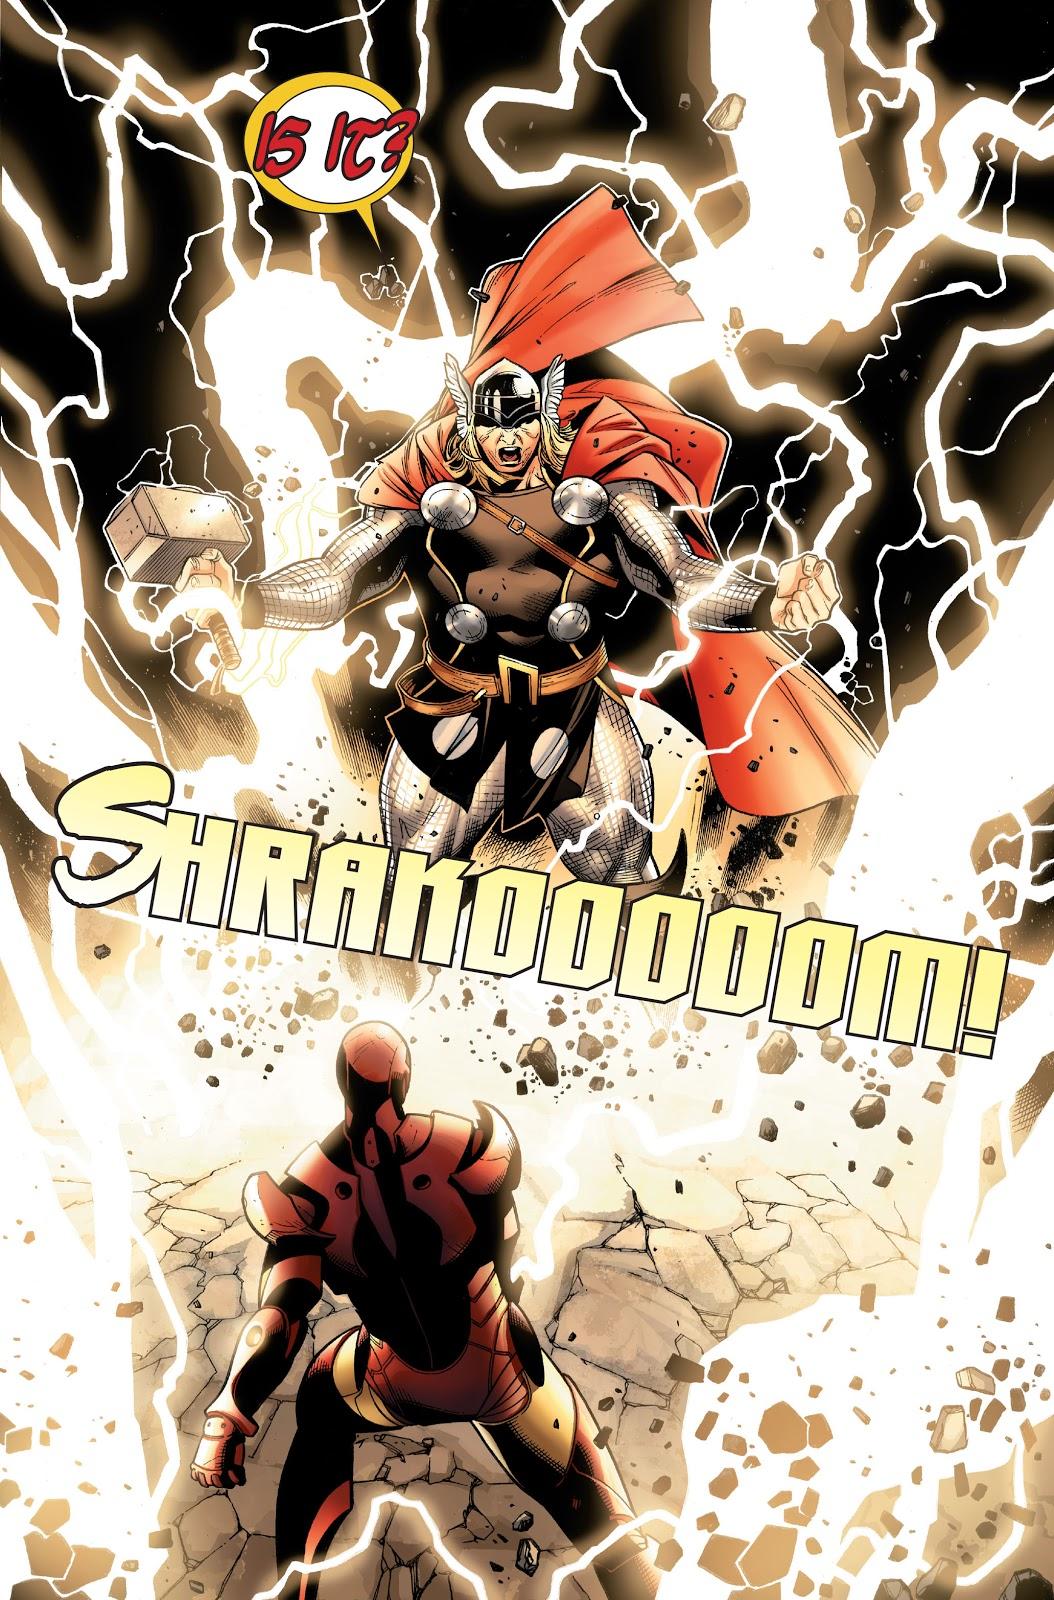 Thor VS Iron Man (Post-Civil War)